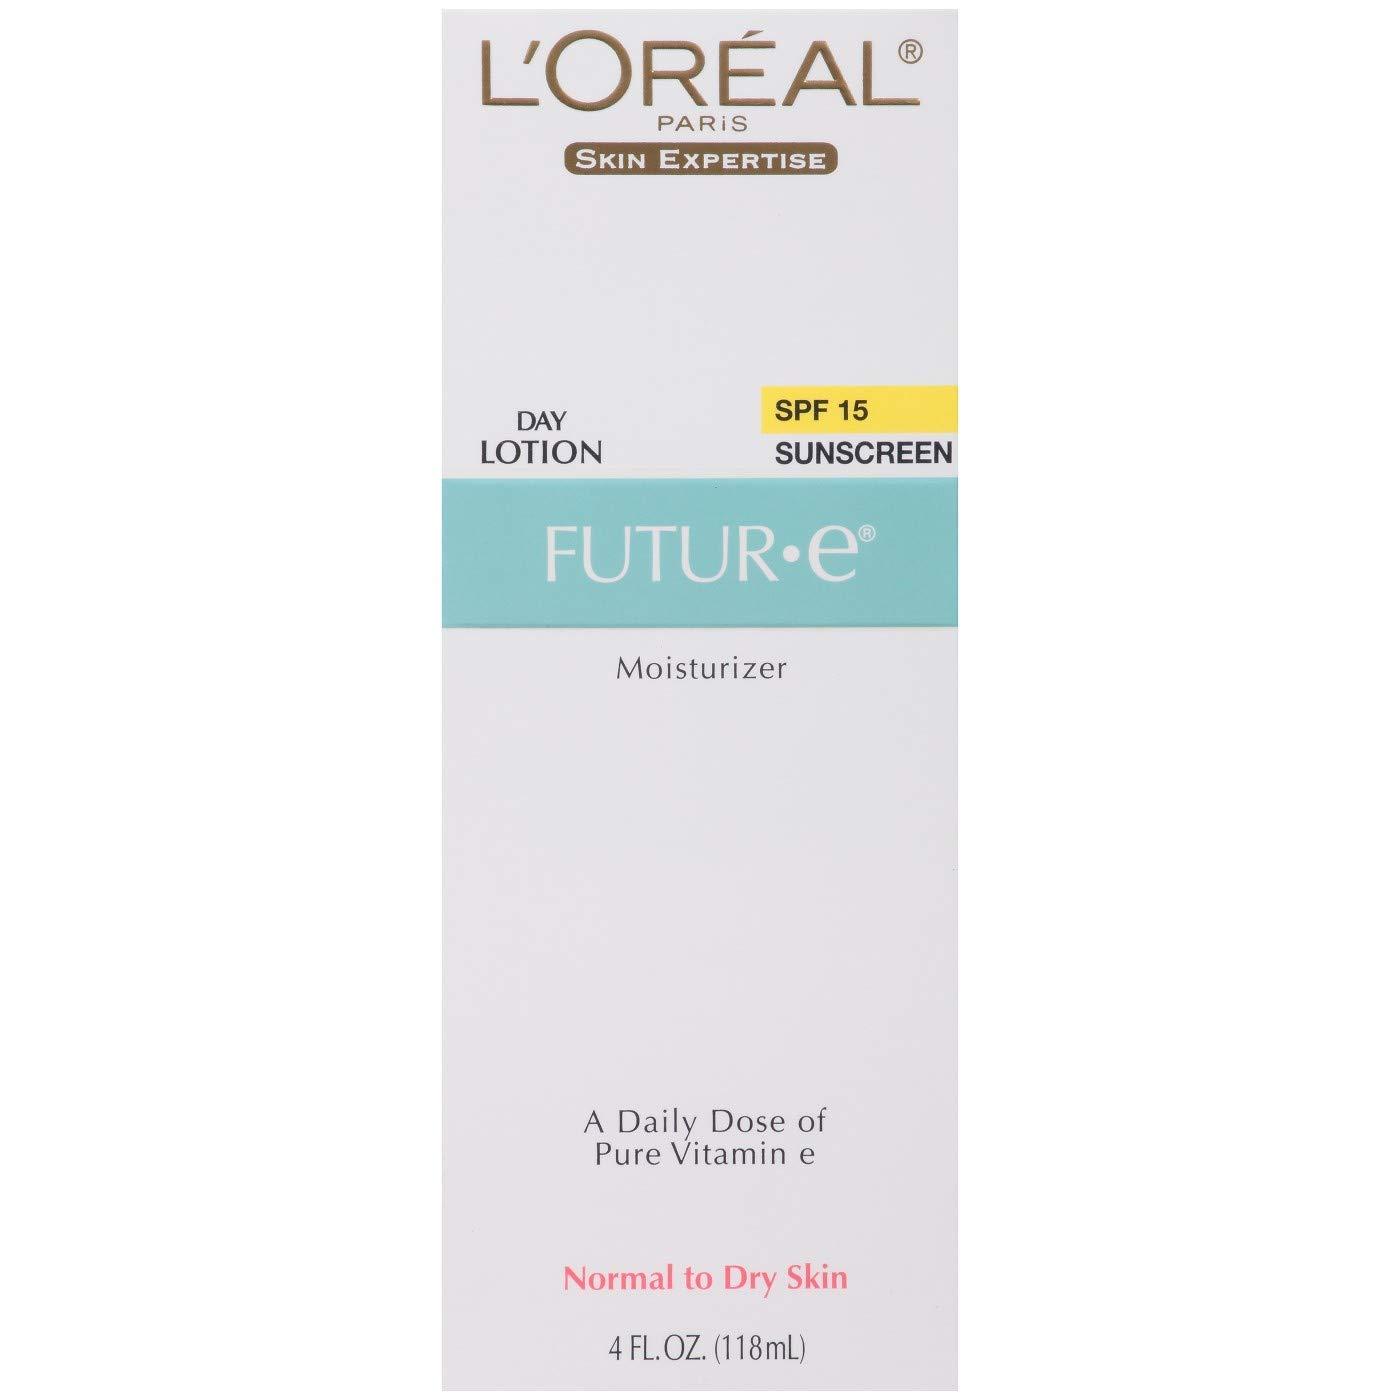 L'Oreal Paris Skin Expertise Future Moisturizer + a Daily Dose of Pure Vitamin E, SPF 15 4 oz (Pack of 4)